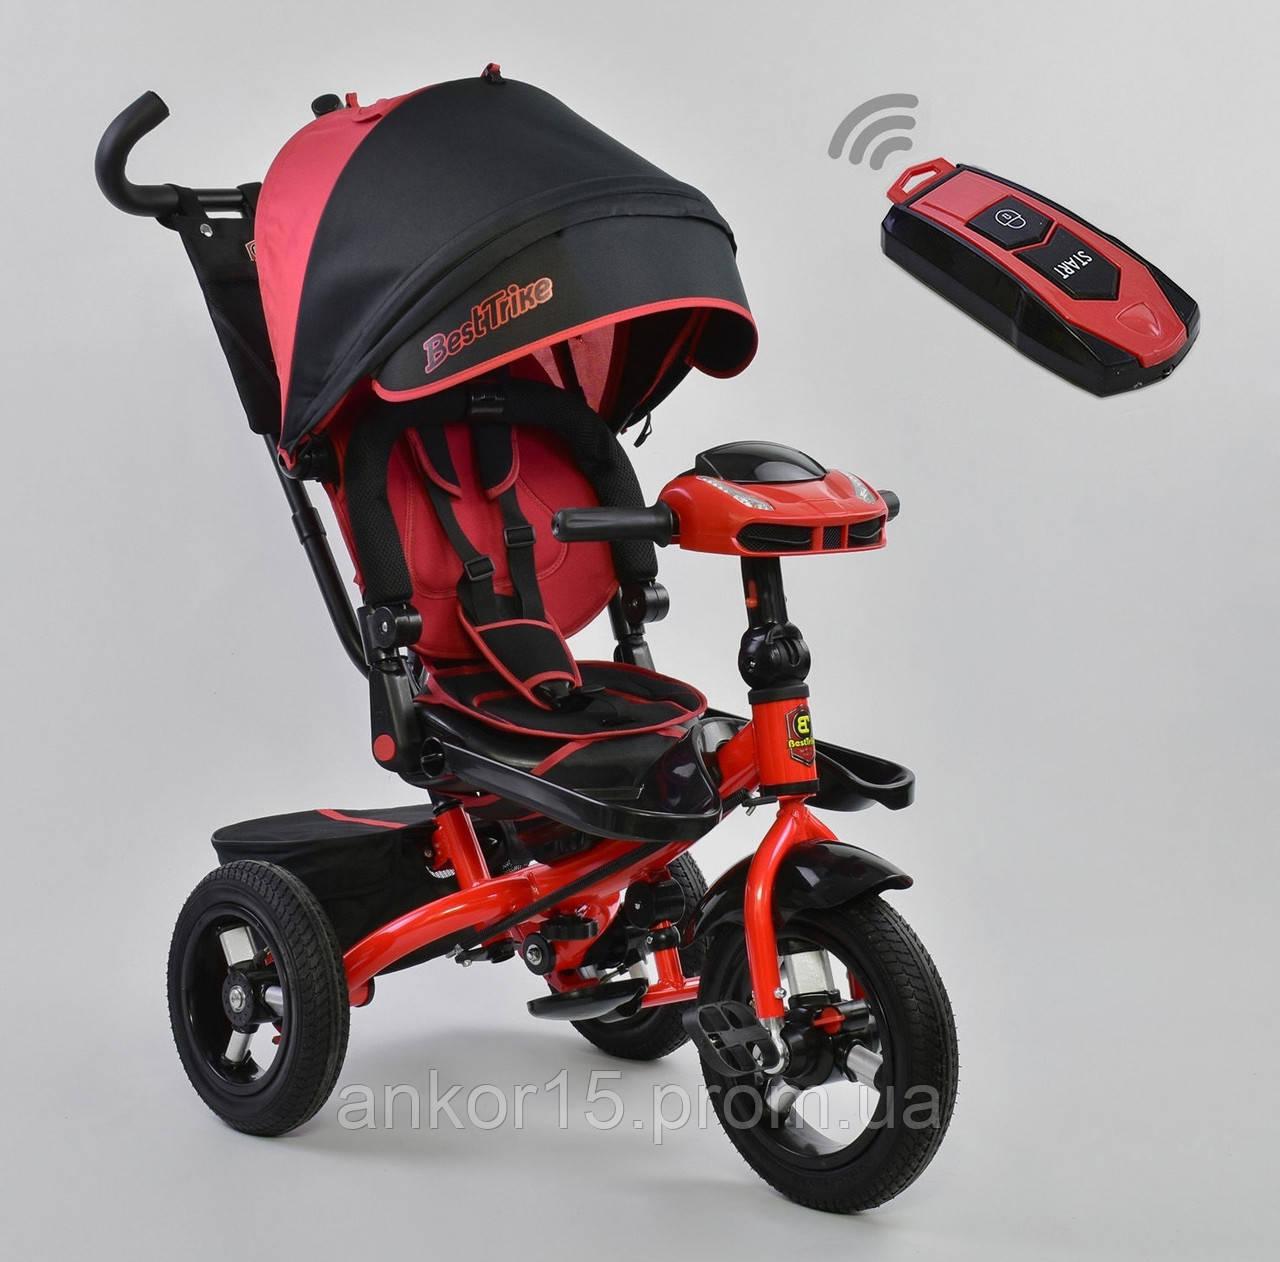 Детский трехколесный велосипед Best Trike 6088 F 1120 New Red-Black